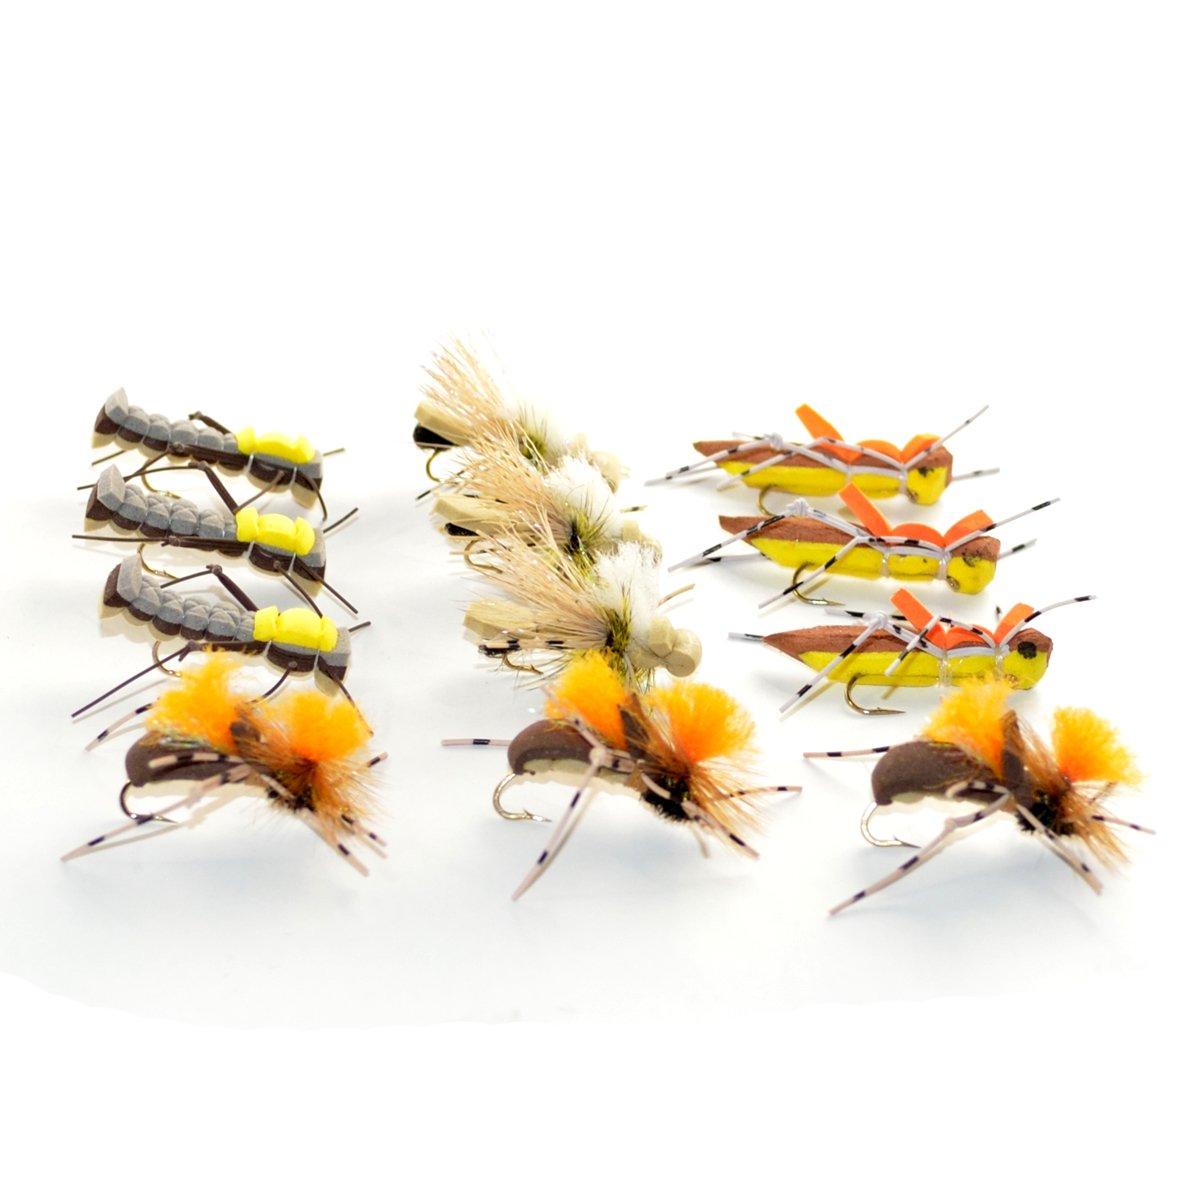 Grasshopper Trout Fly Fishing Flies Assortment Dropper Hopper Foam Body 12 Flies 4 Patterns Trout Fly Collection